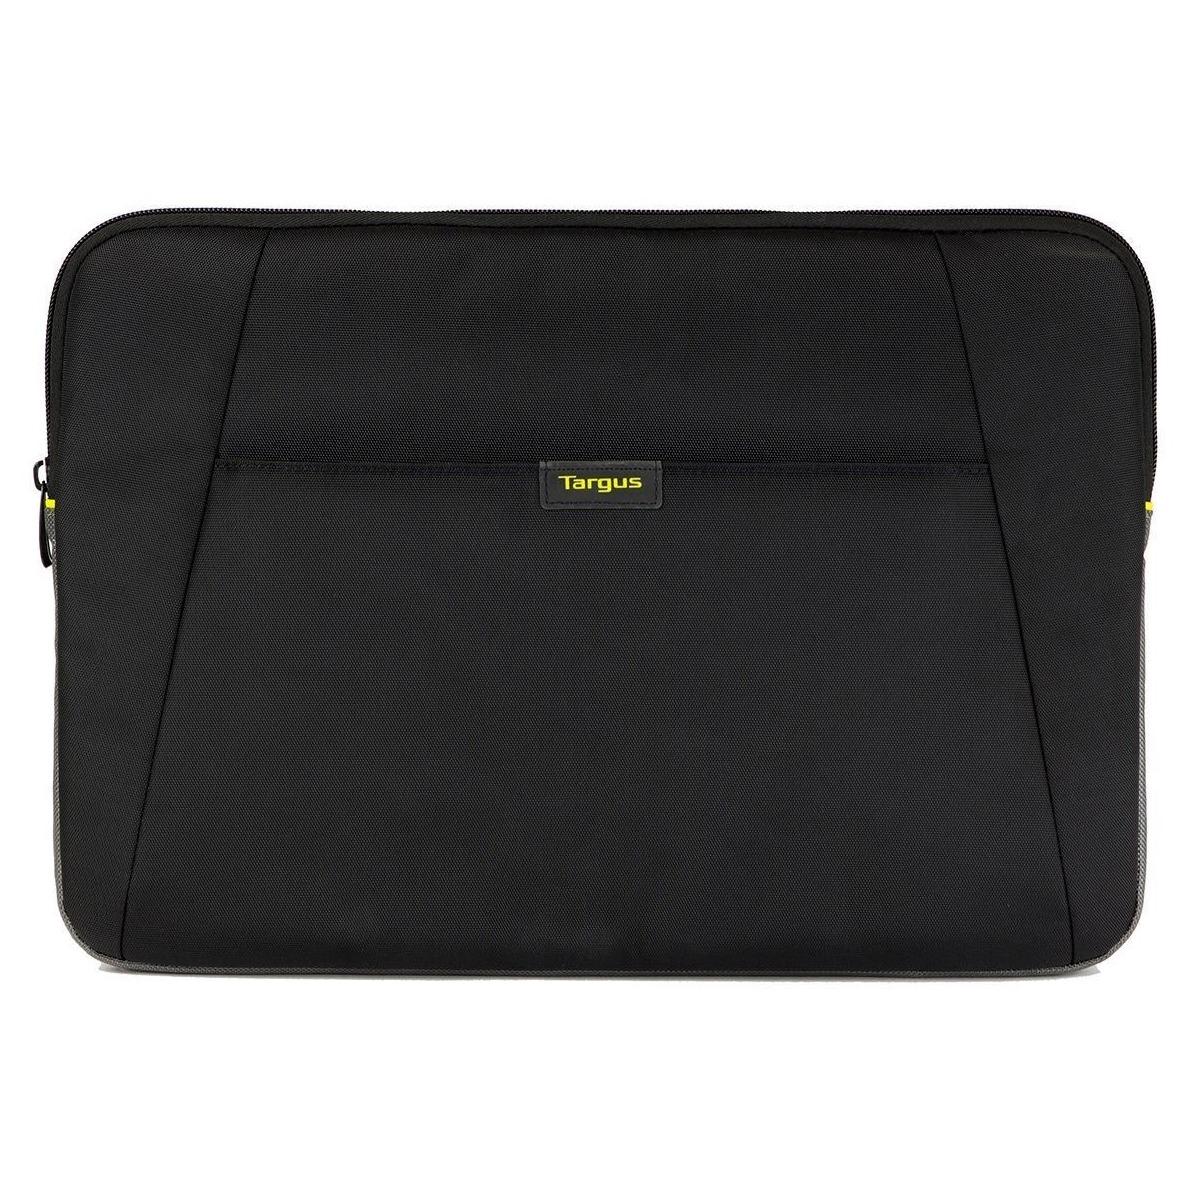 Targus CityGear 13.3inch Laptop Sleeve Black (TSS930EU)